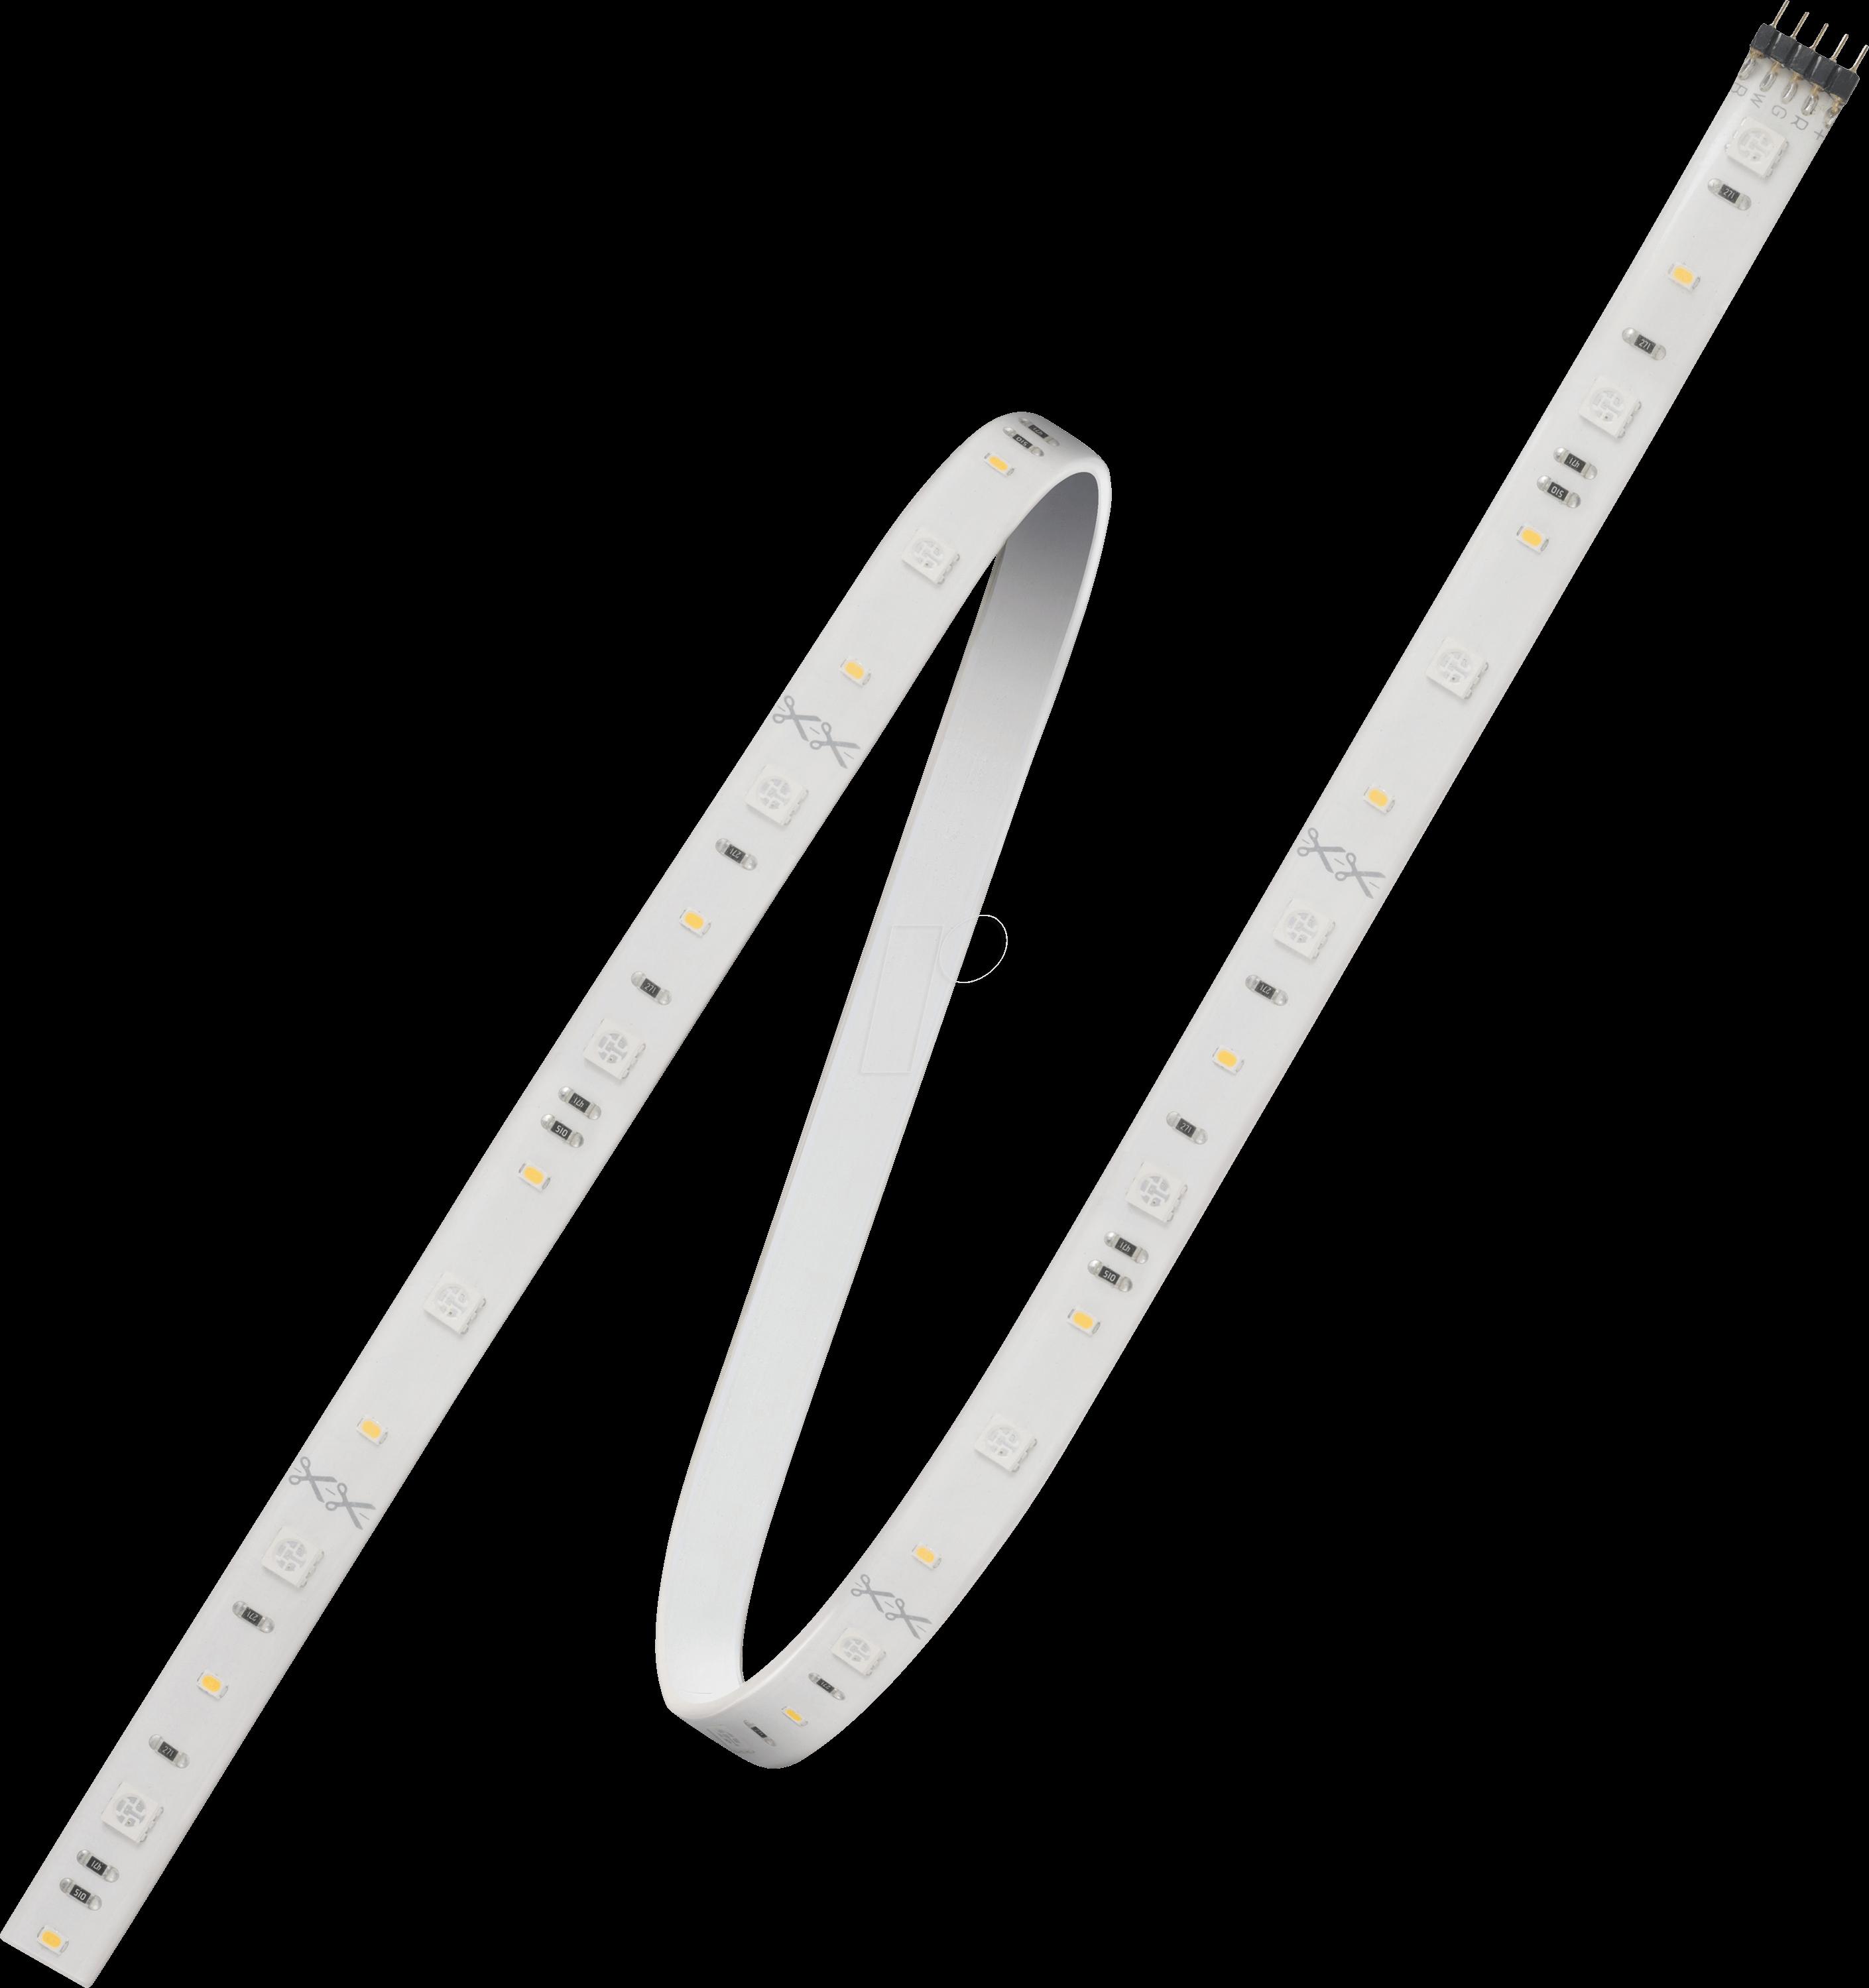 osr 5036123 smart light led stripe smart flex 3p eek b bei reichelt elektronik. Black Bedroom Furniture Sets. Home Design Ideas